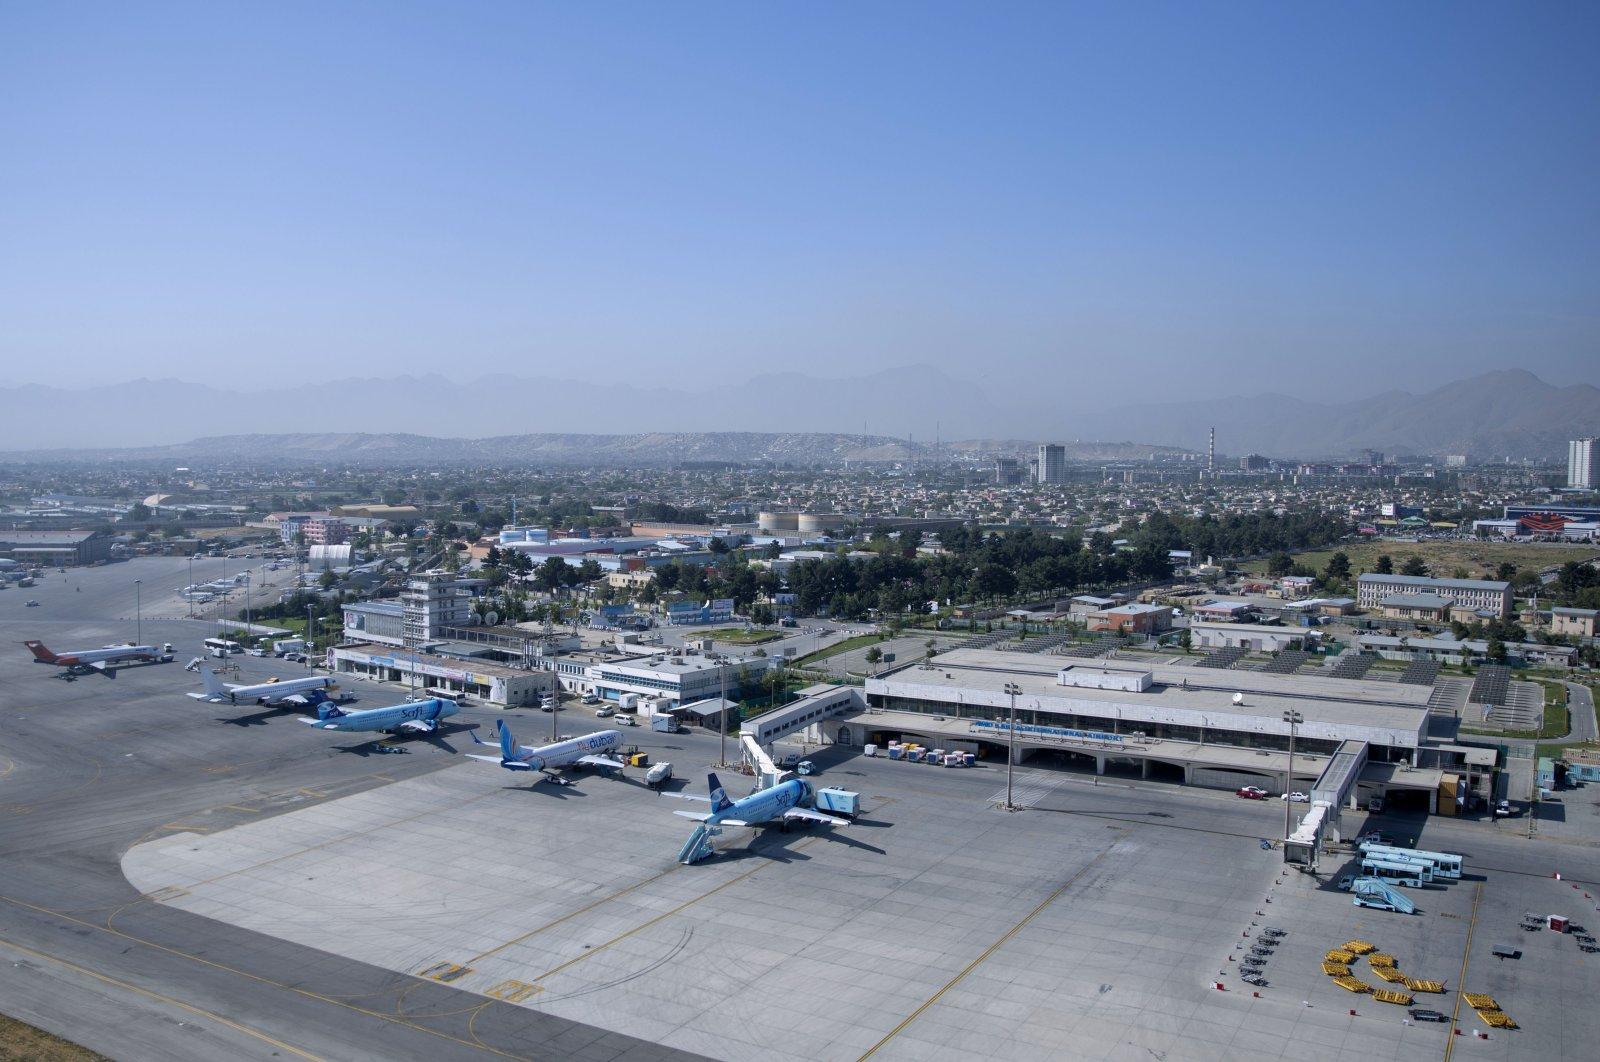 Hamid Karzai International airport in Kabul, Afghanistan, July 25, 2015. (AP Photo)